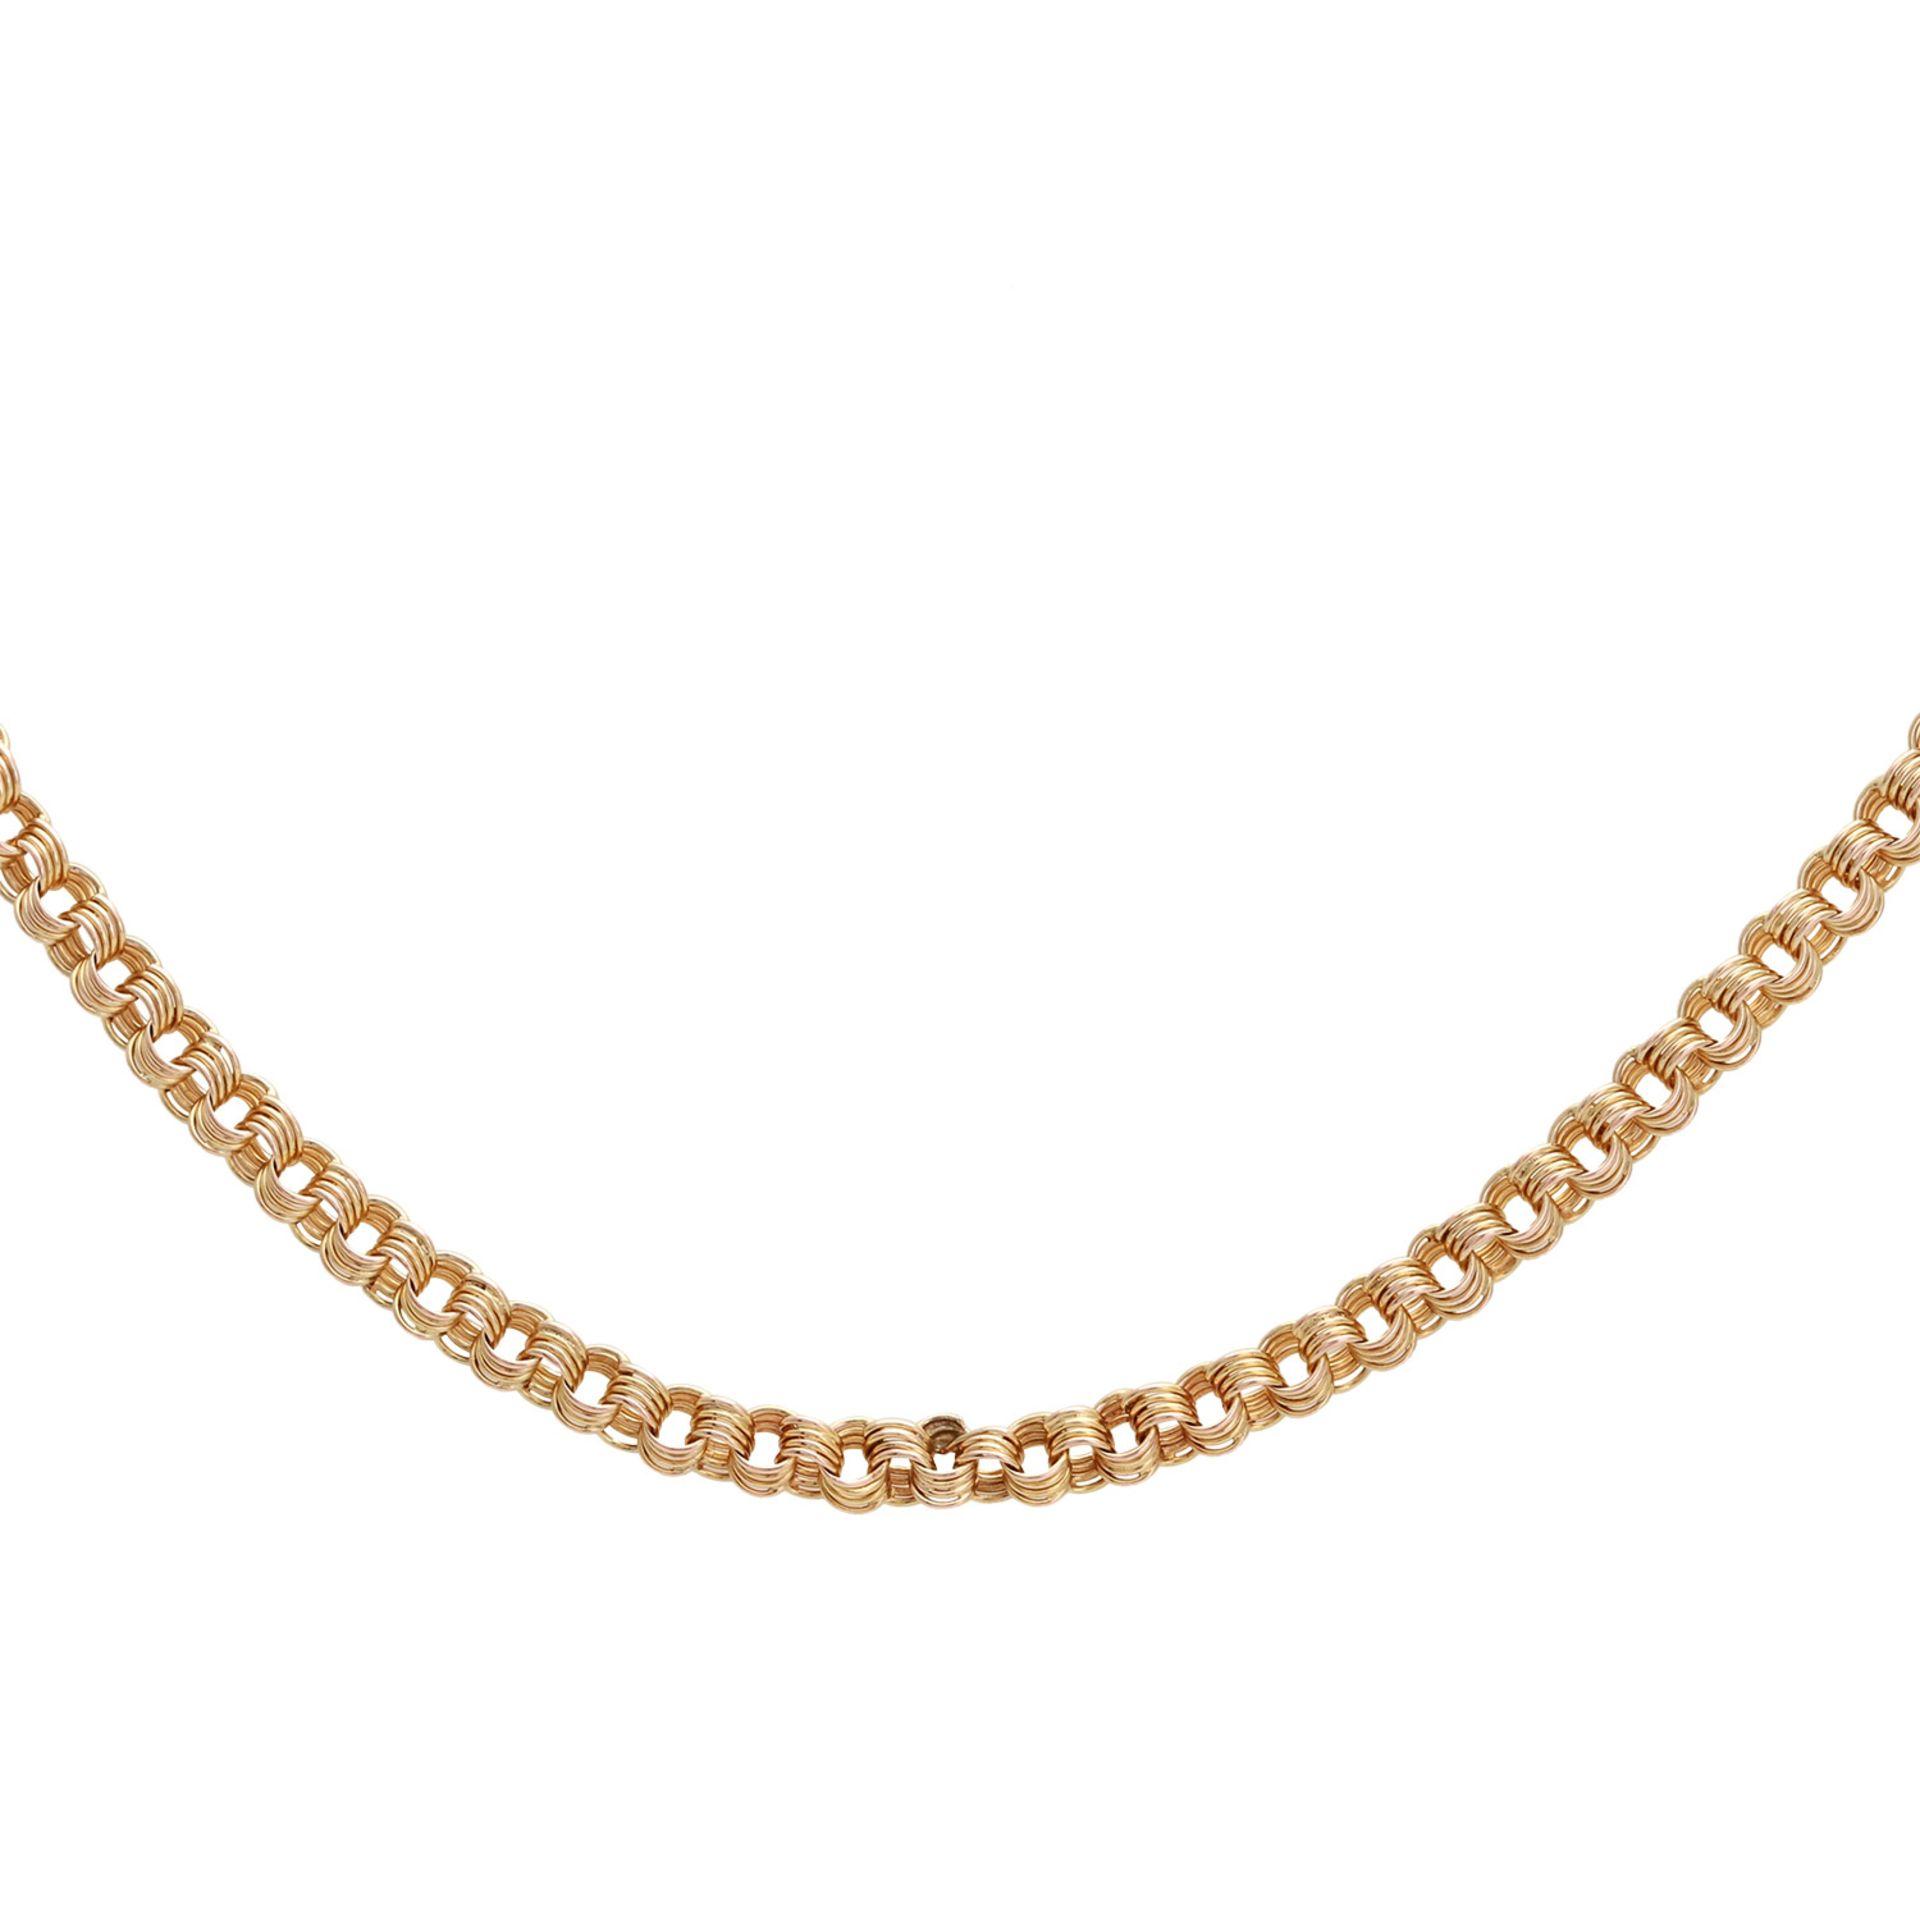 Los 127 - Halskette Fantasiemuster. GG 14K, feines Ösengeflecht, Länge ca. 51,5 cm, Russland.